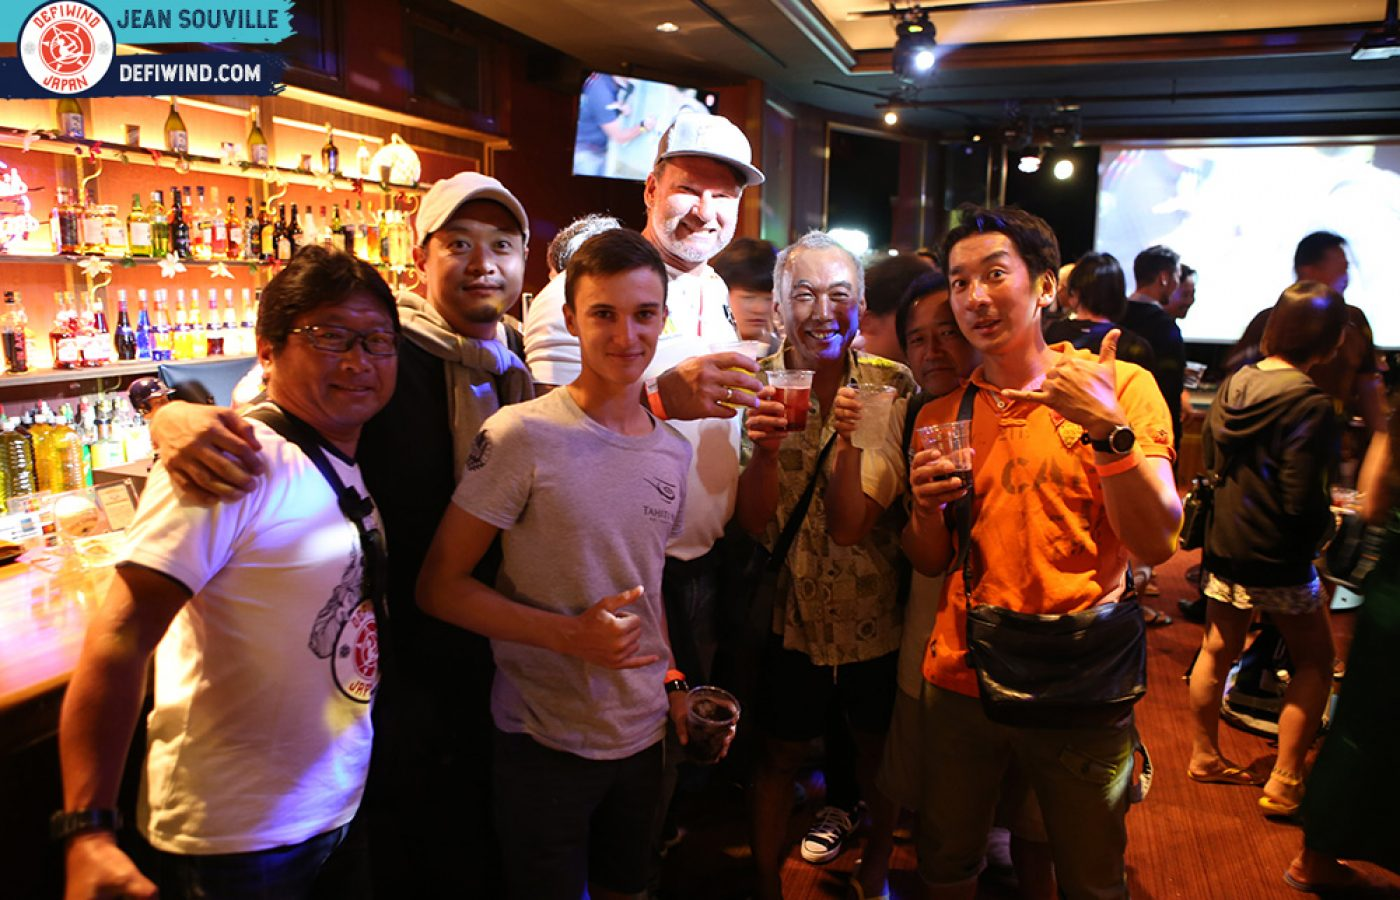 bjorn-soiree-defiwind-japon-race1-miyako-souville01small